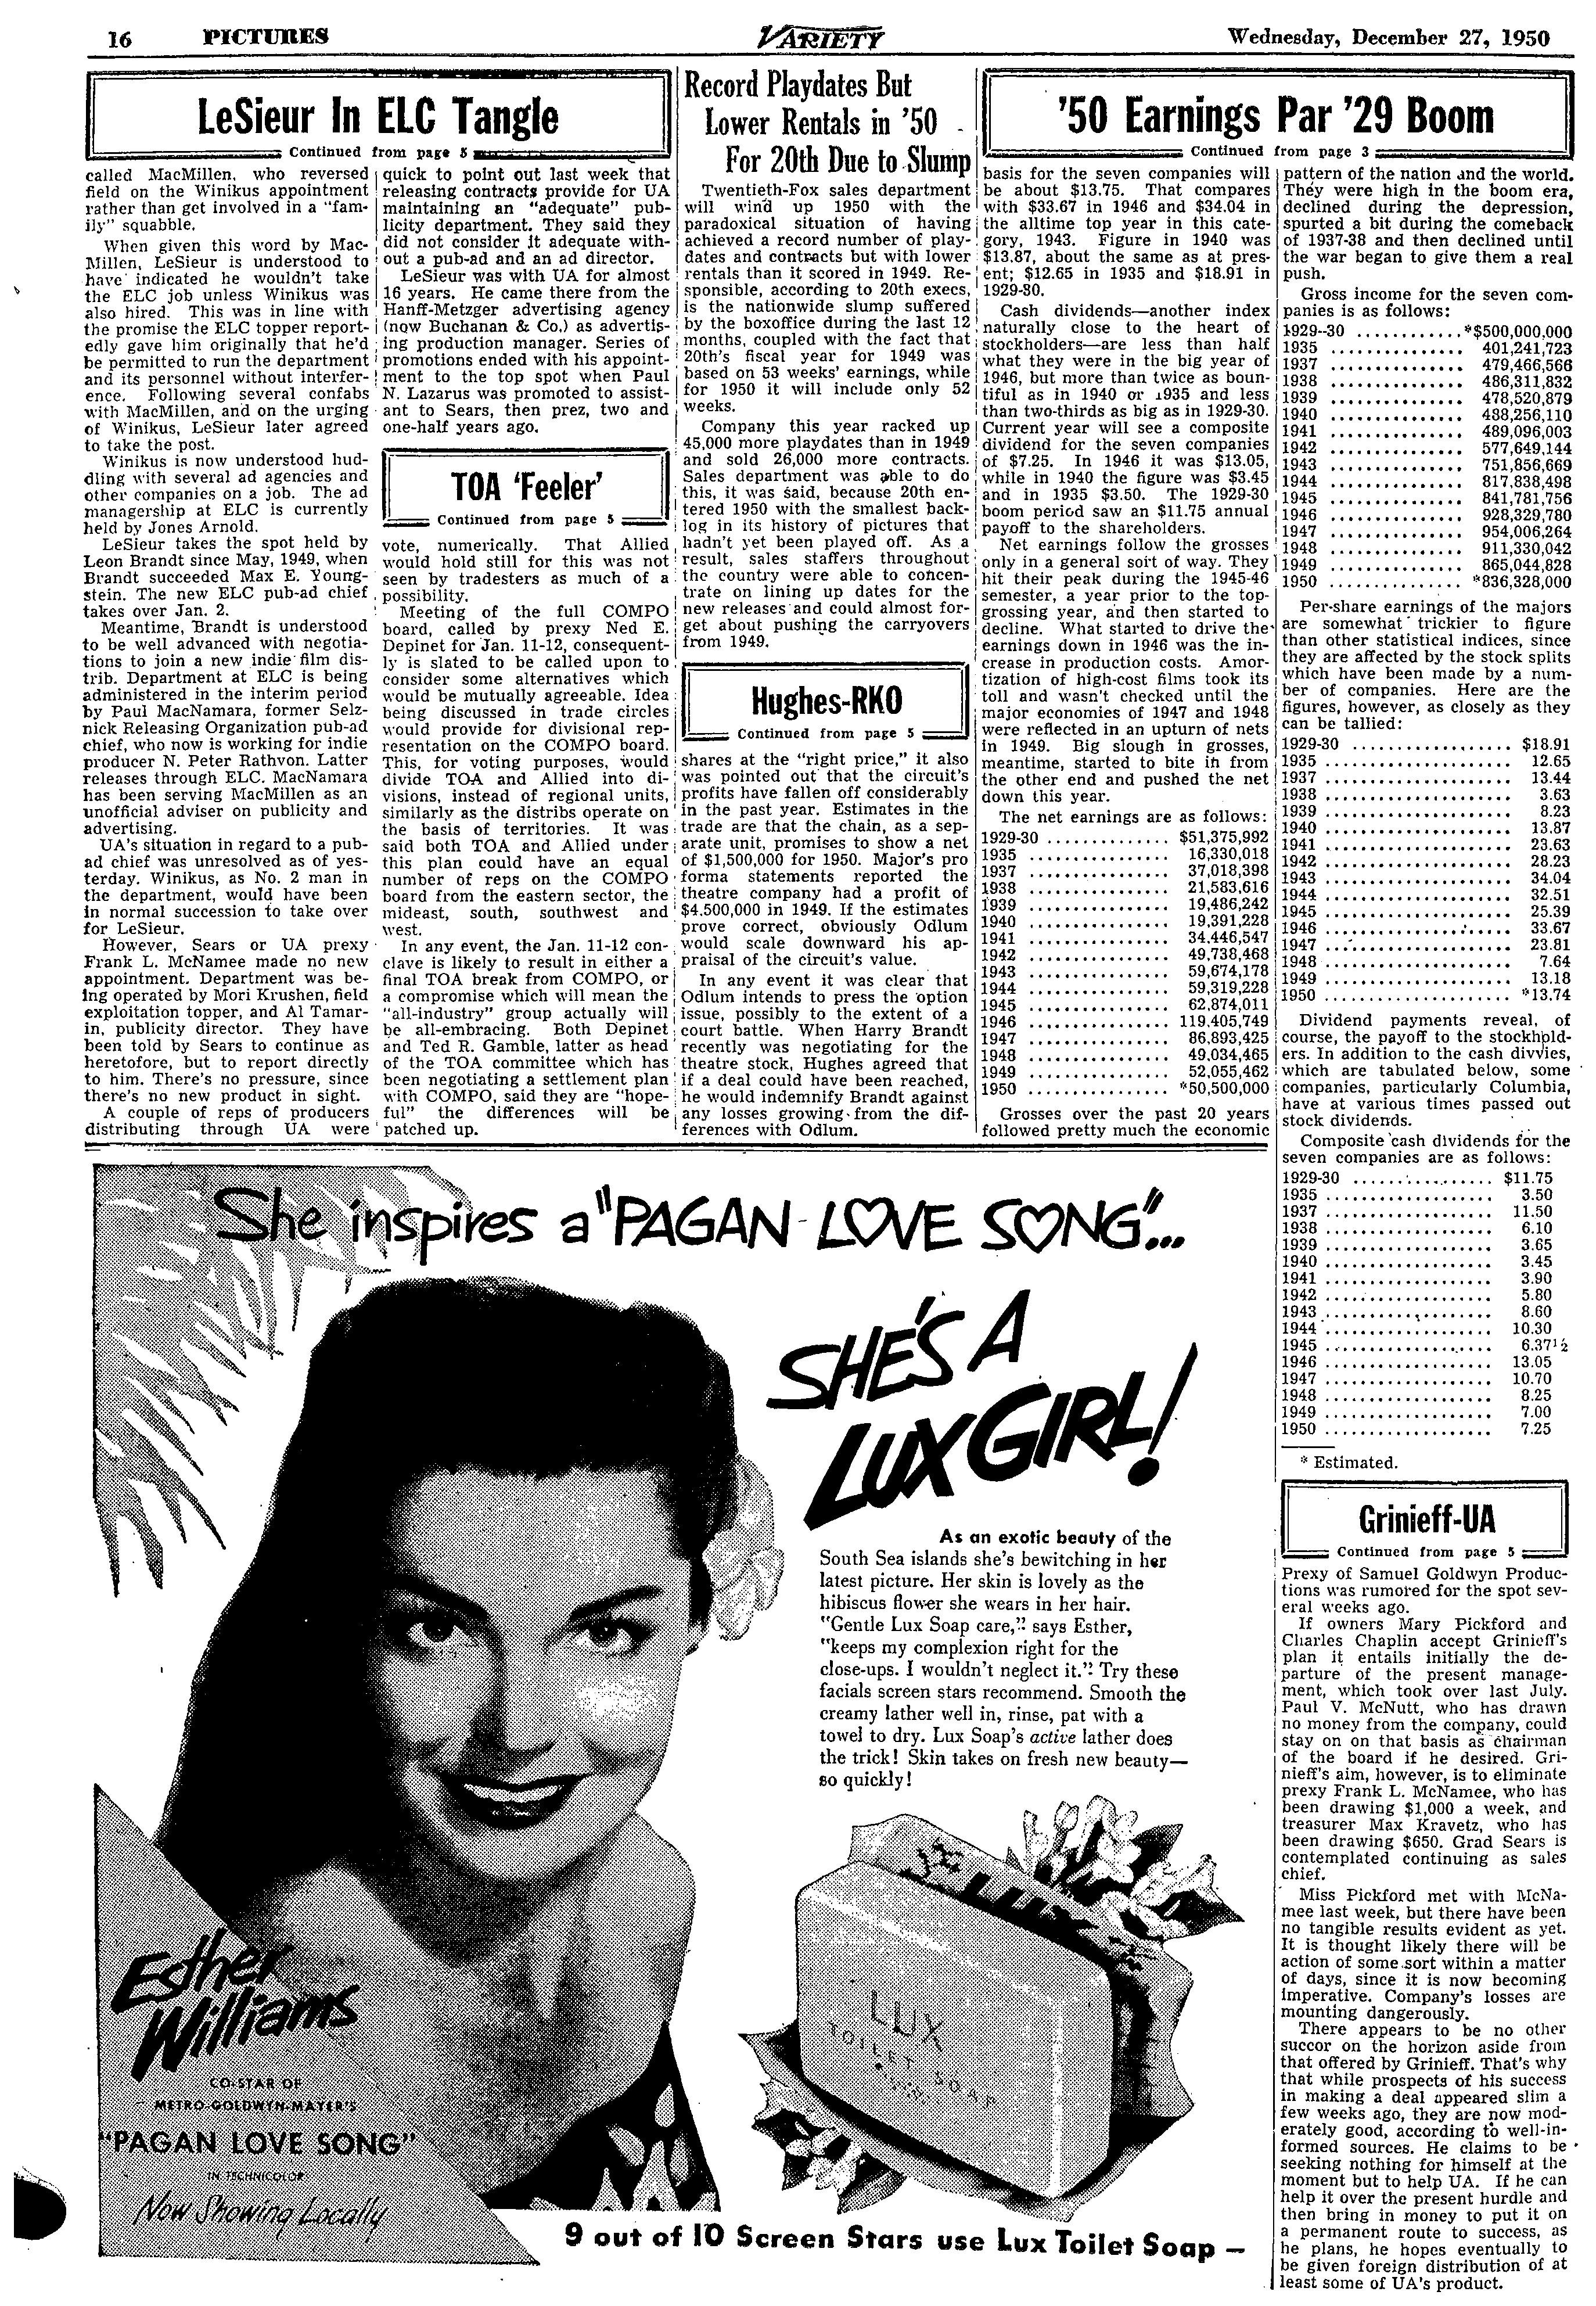 Variety180-1950-12_jp2.zip&file=variety180-1950-12_jp2%2fvariety180-1950-12_0219